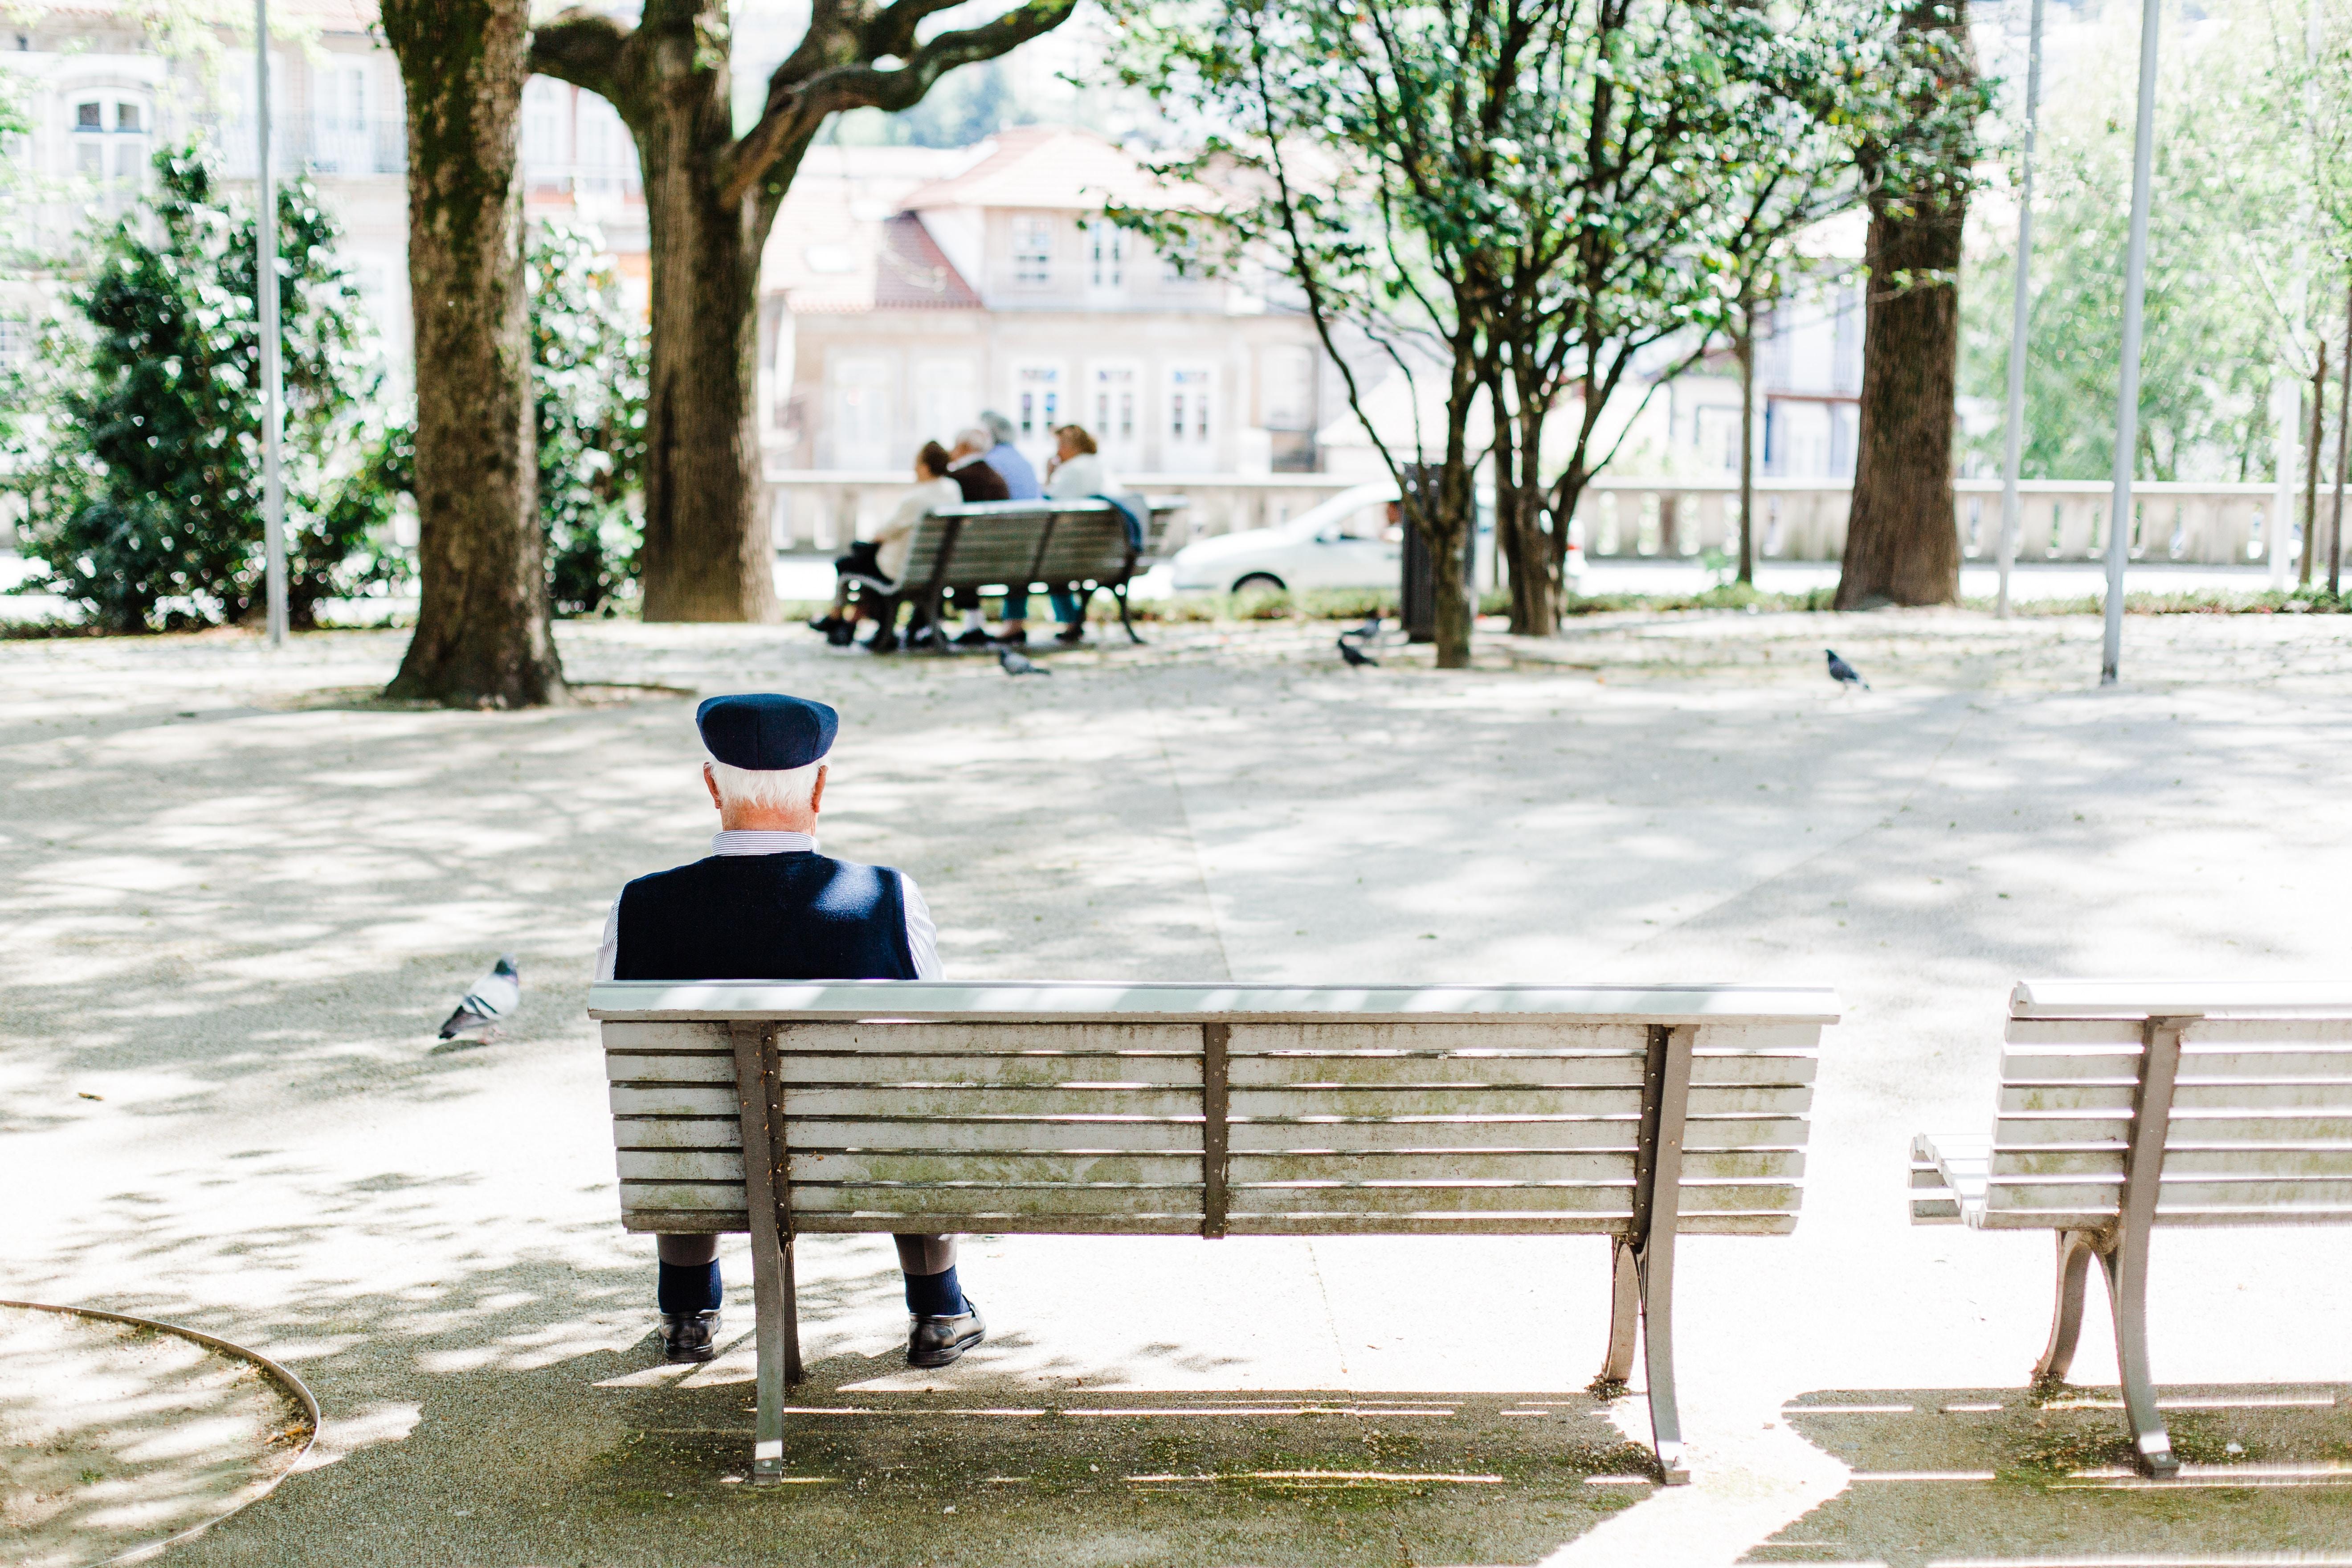 anziano polacco seduto sulla panchina a Cracovia